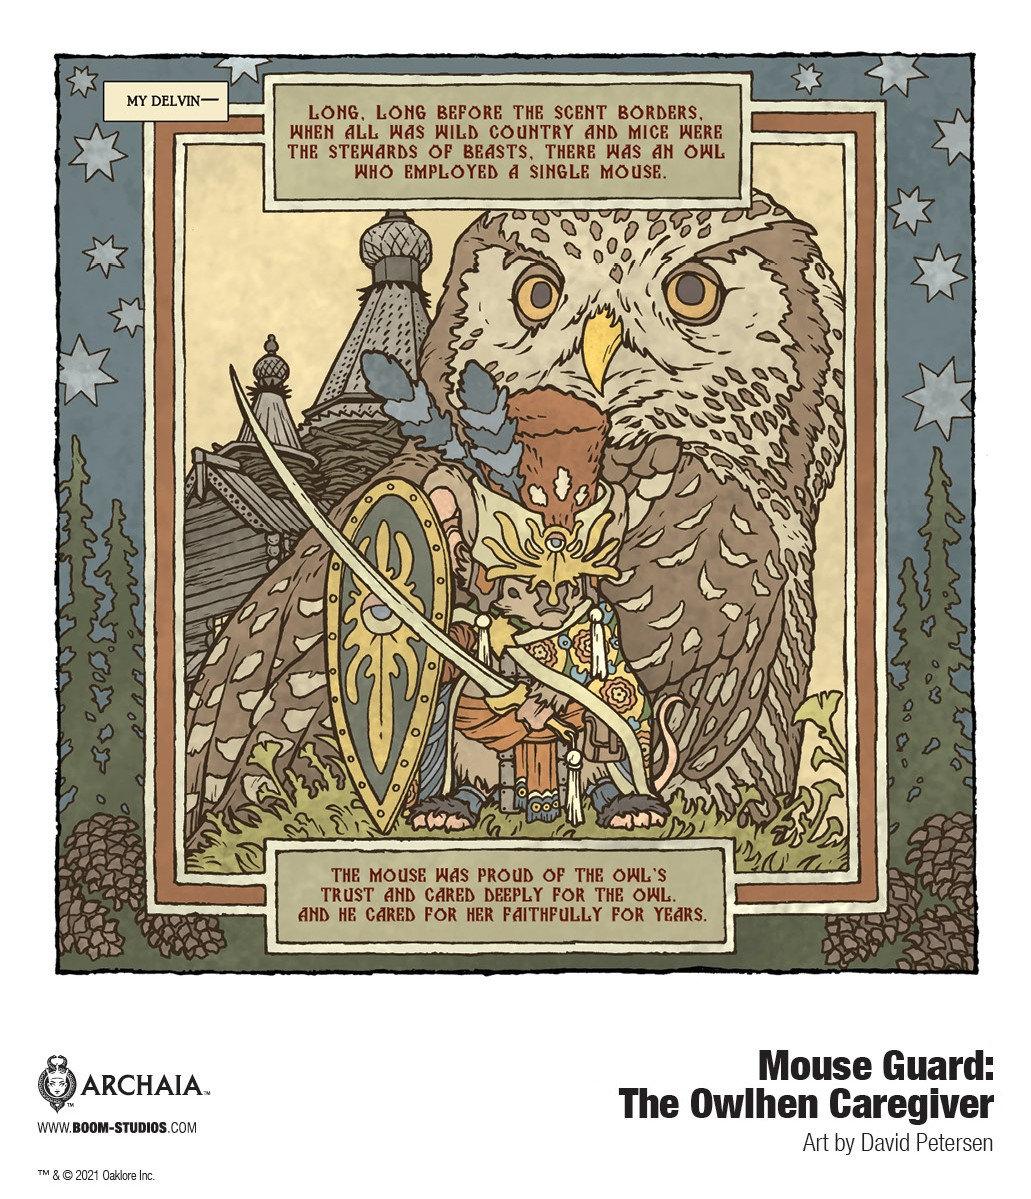 MouseGuard_OwlhenCaregiver_InteriorArt_002_PROMO MOUSE GUARD welcomes back David Petersen in THE OWLHEN CAREGIVER